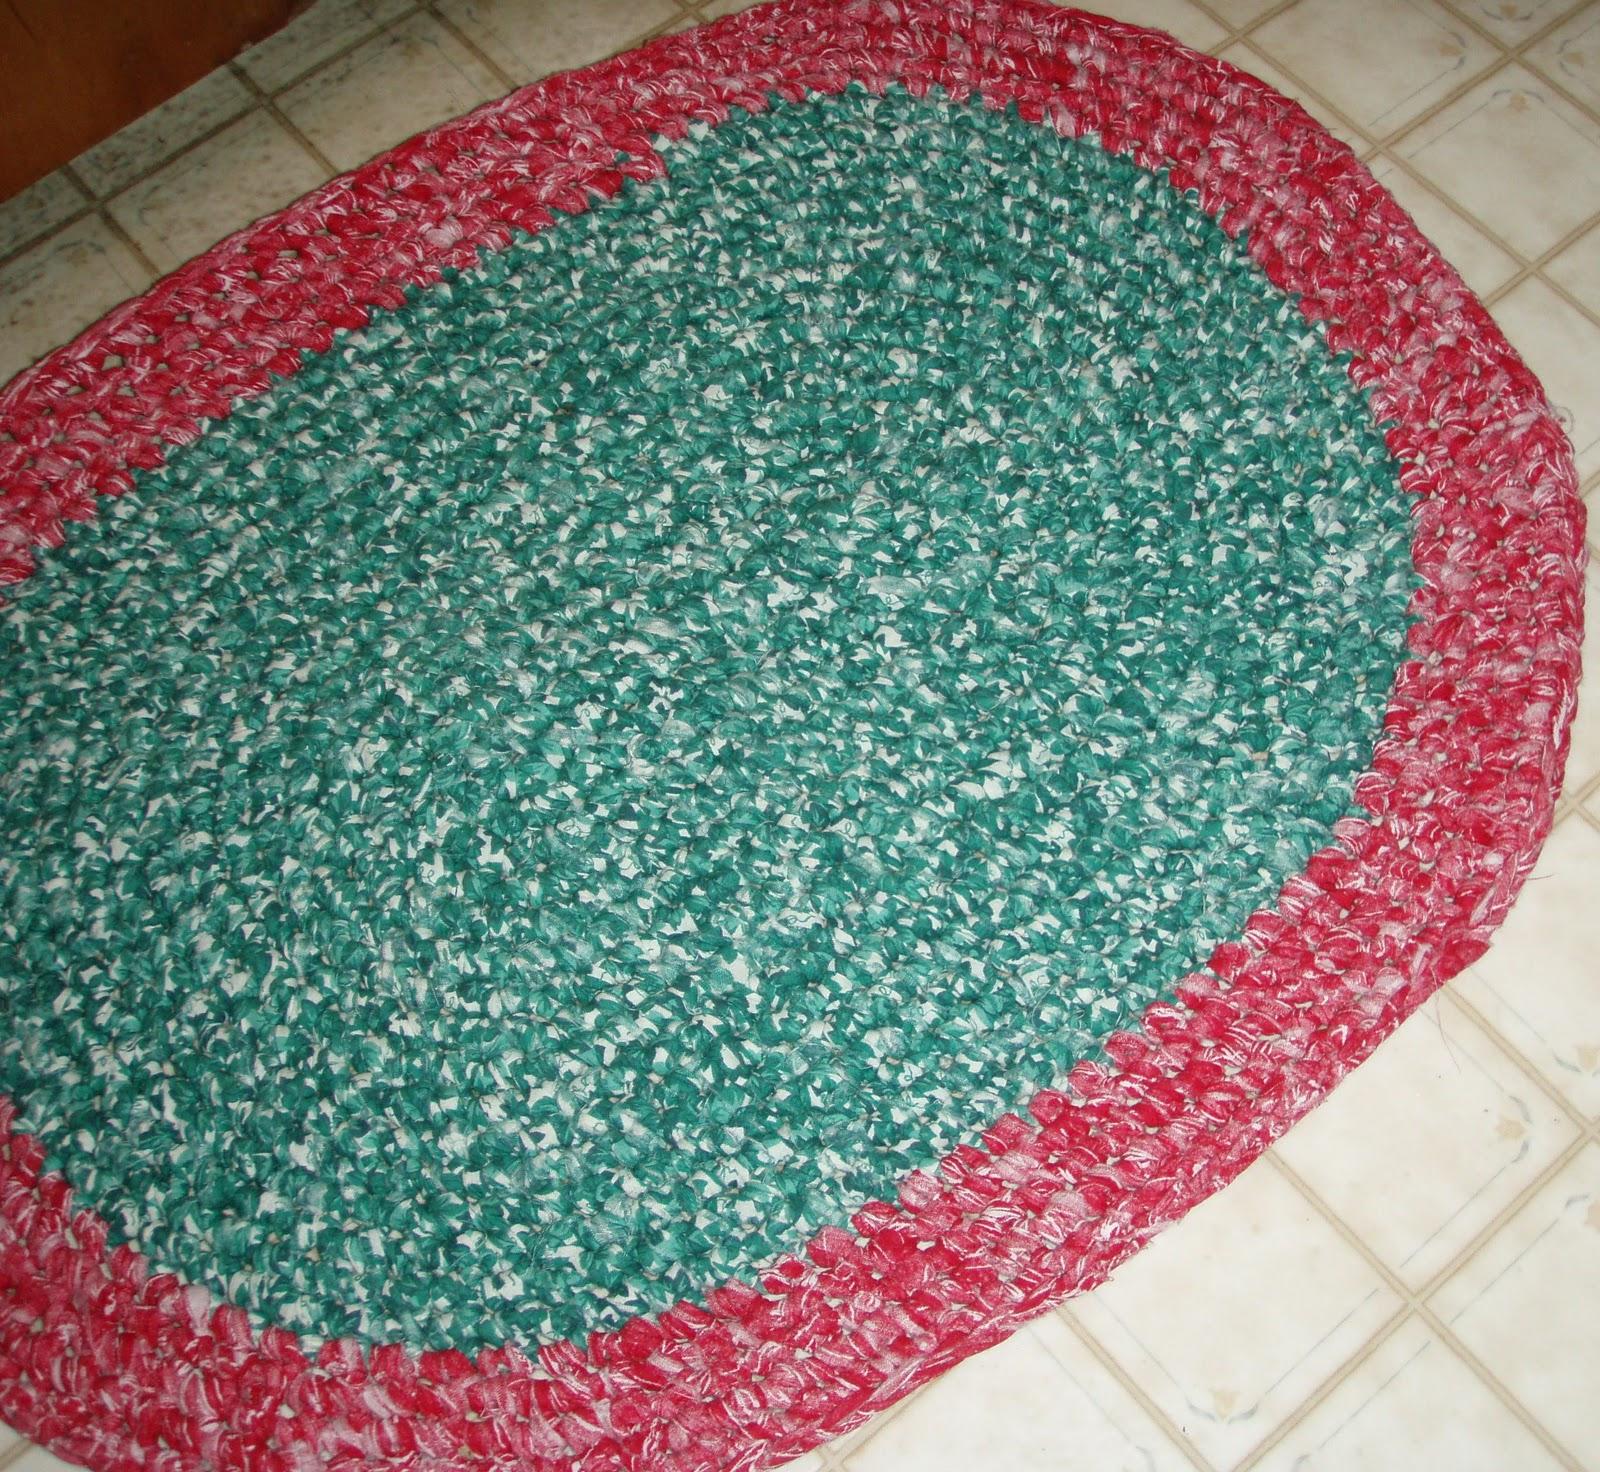 Crochet A Rag Rug Instructions: Heather's Green Home Goods: Crocheted Rag Rug Tutorial